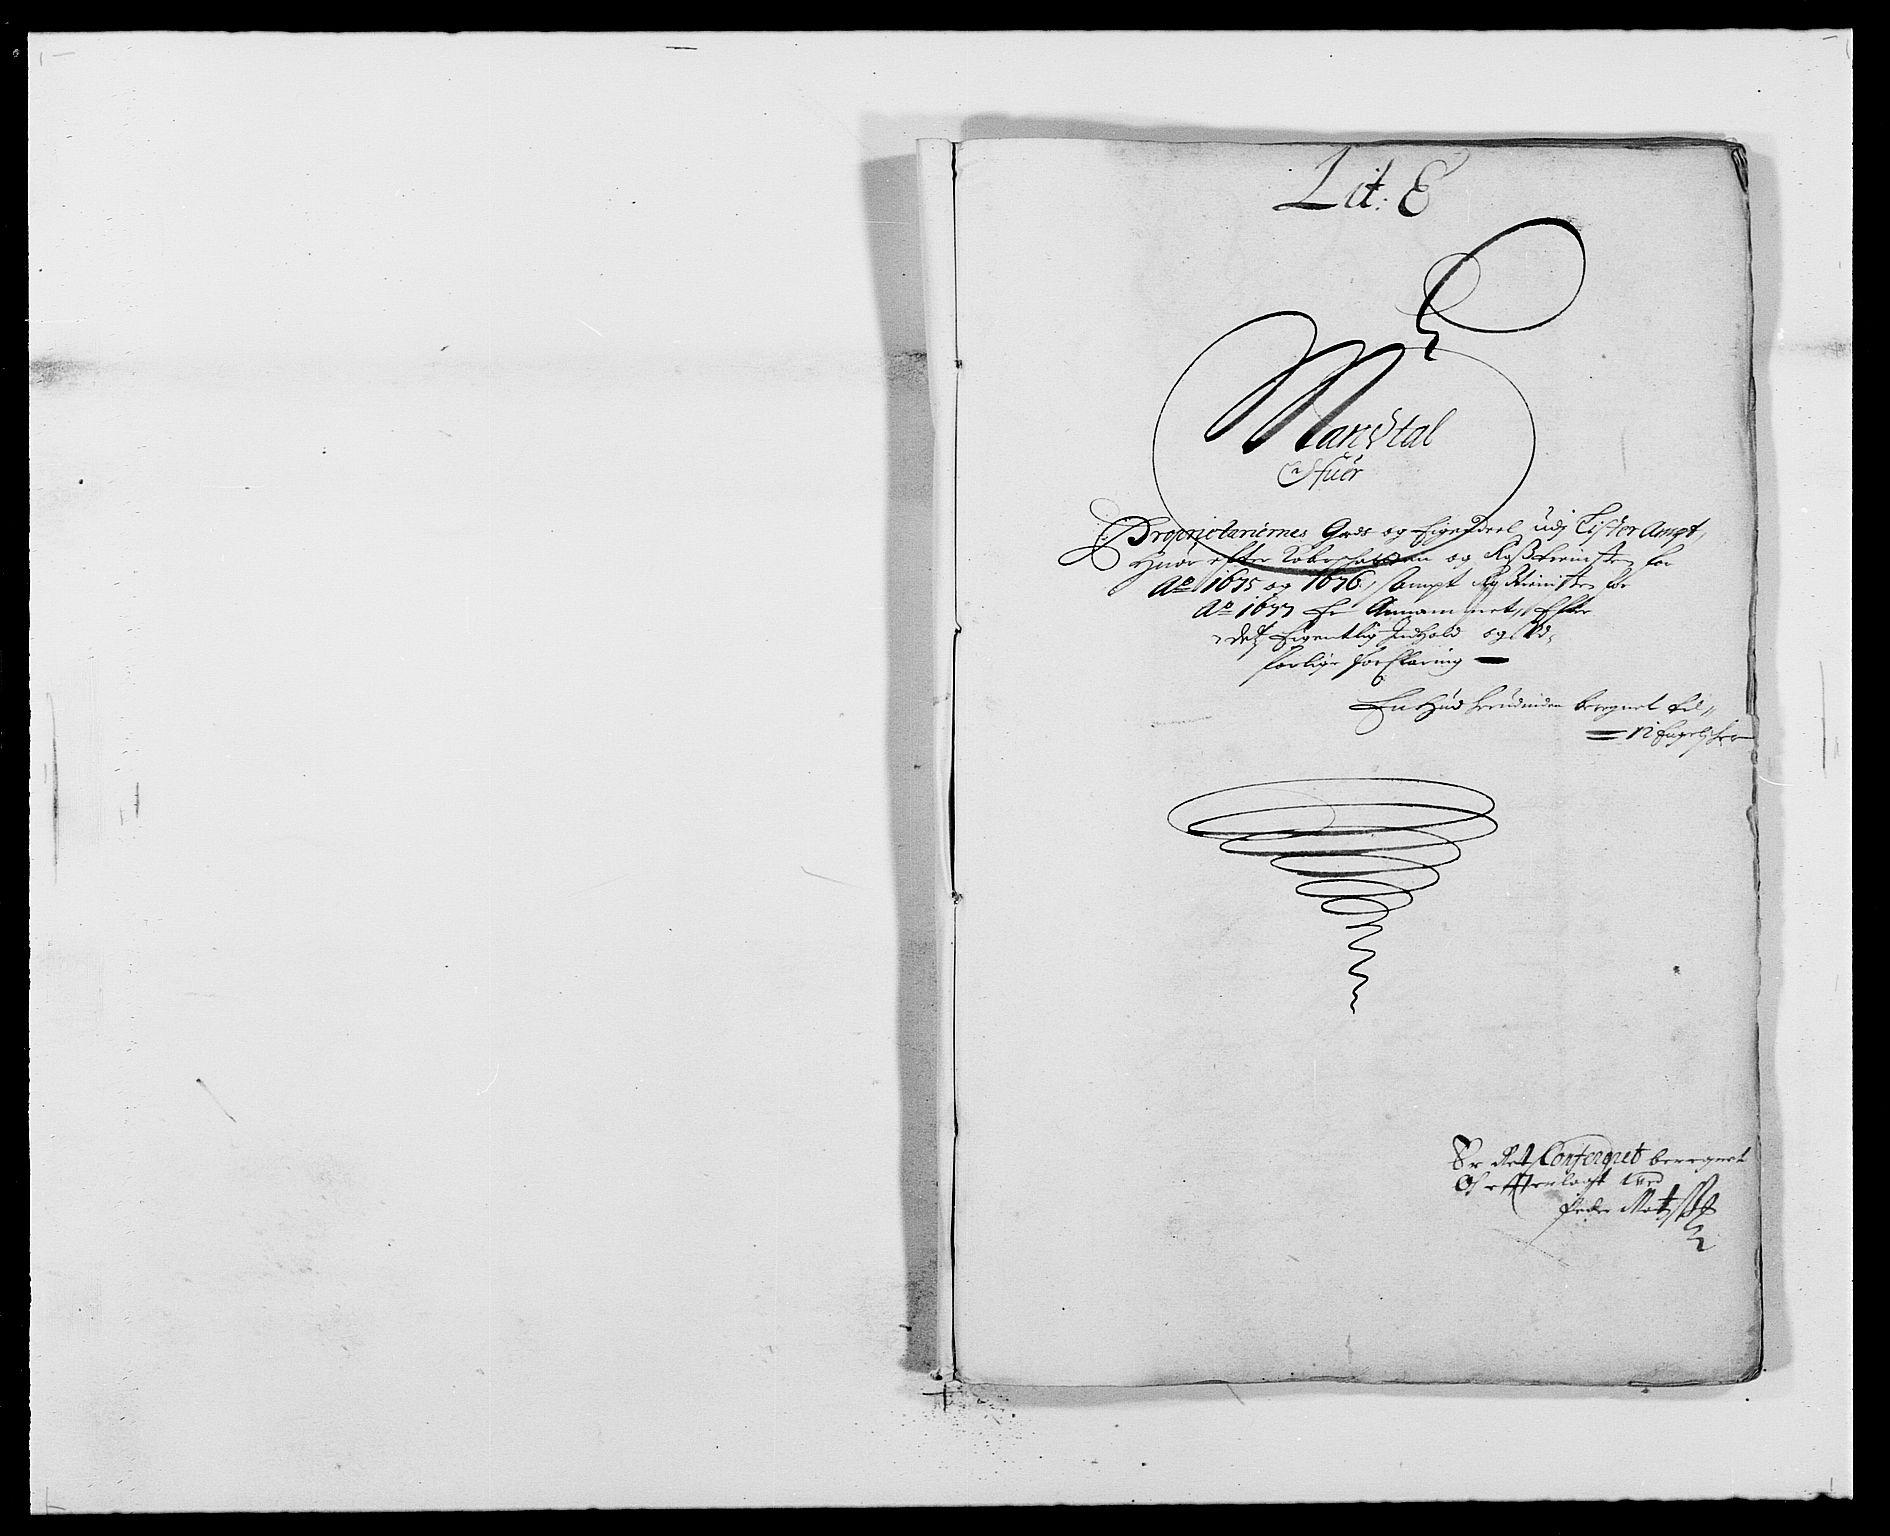 RA, Rentekammeret inntil 1814, Reviderte regnskaper, Fogderegnskap, R41/L2530: Fogderegnskap Lista, 1677-1679, s. 91